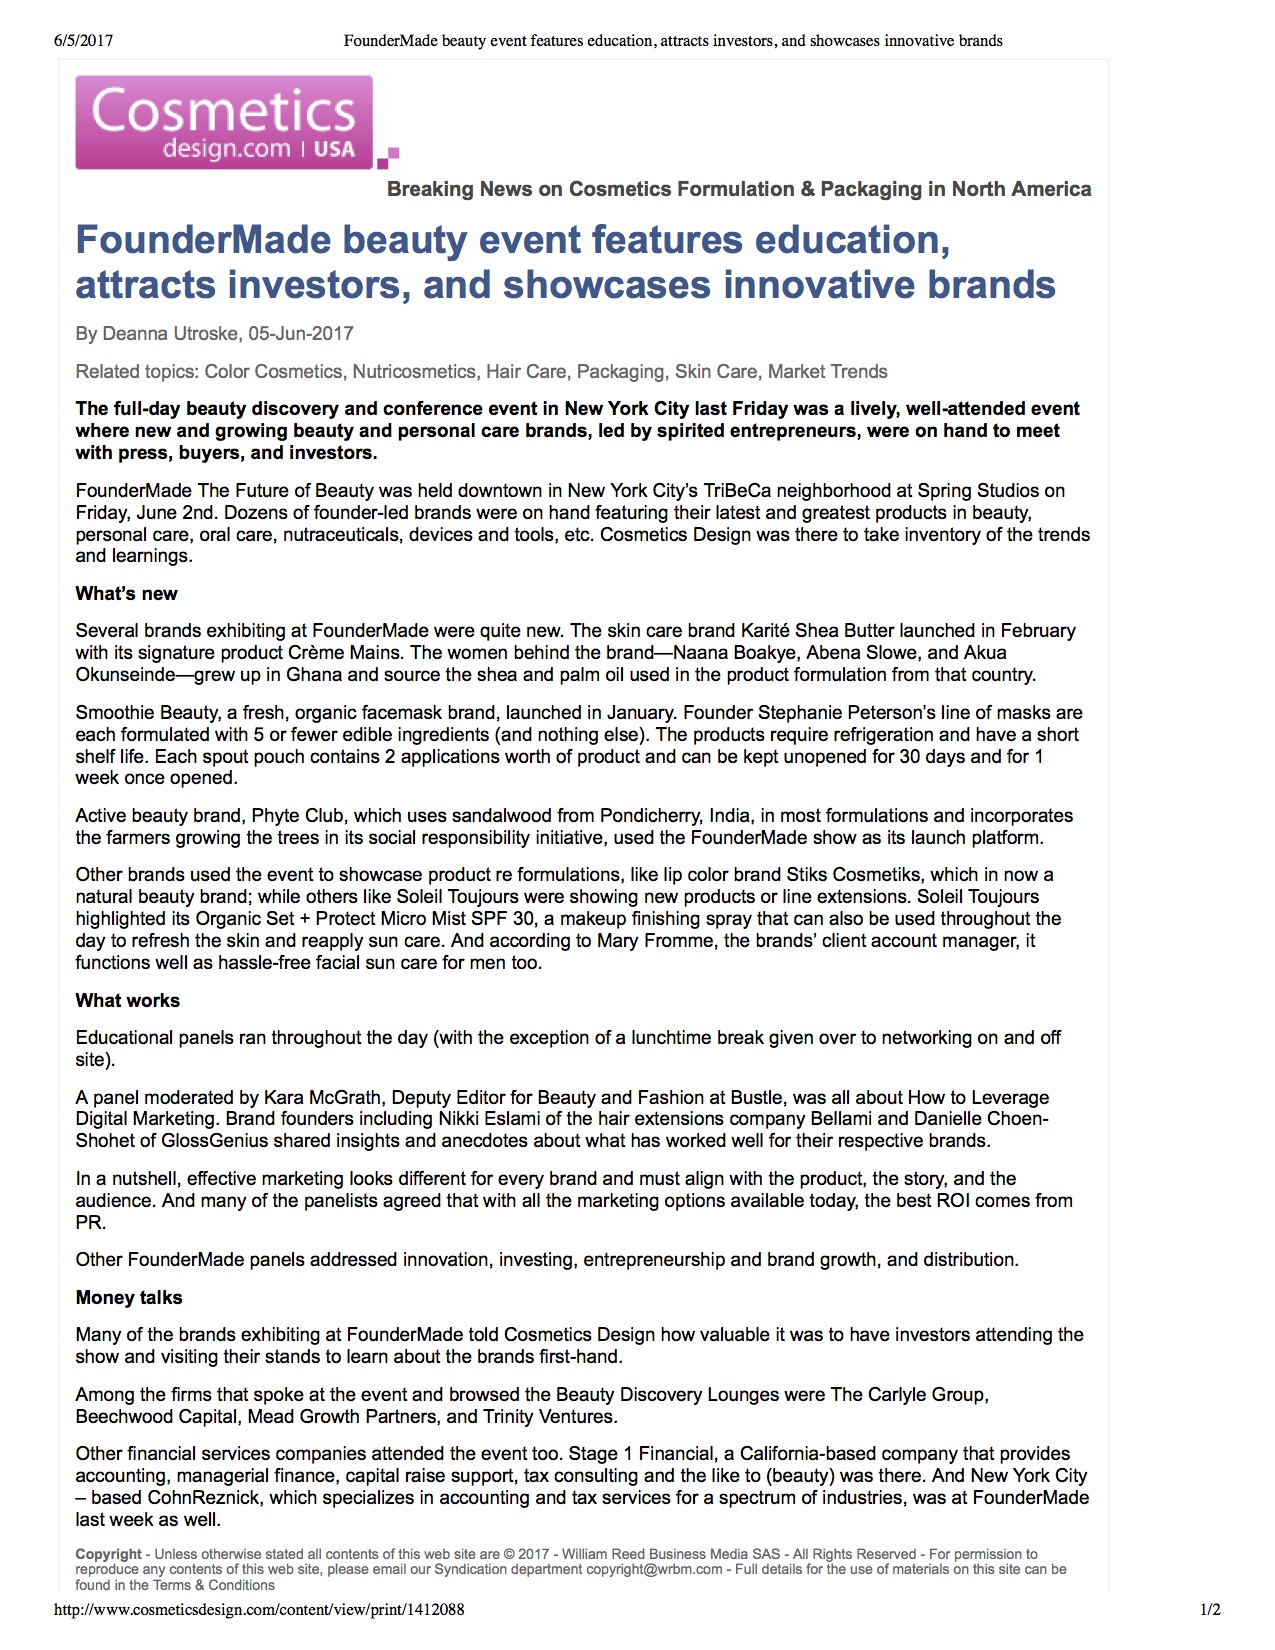 Cosmeticsdesign.com 5th june 2017